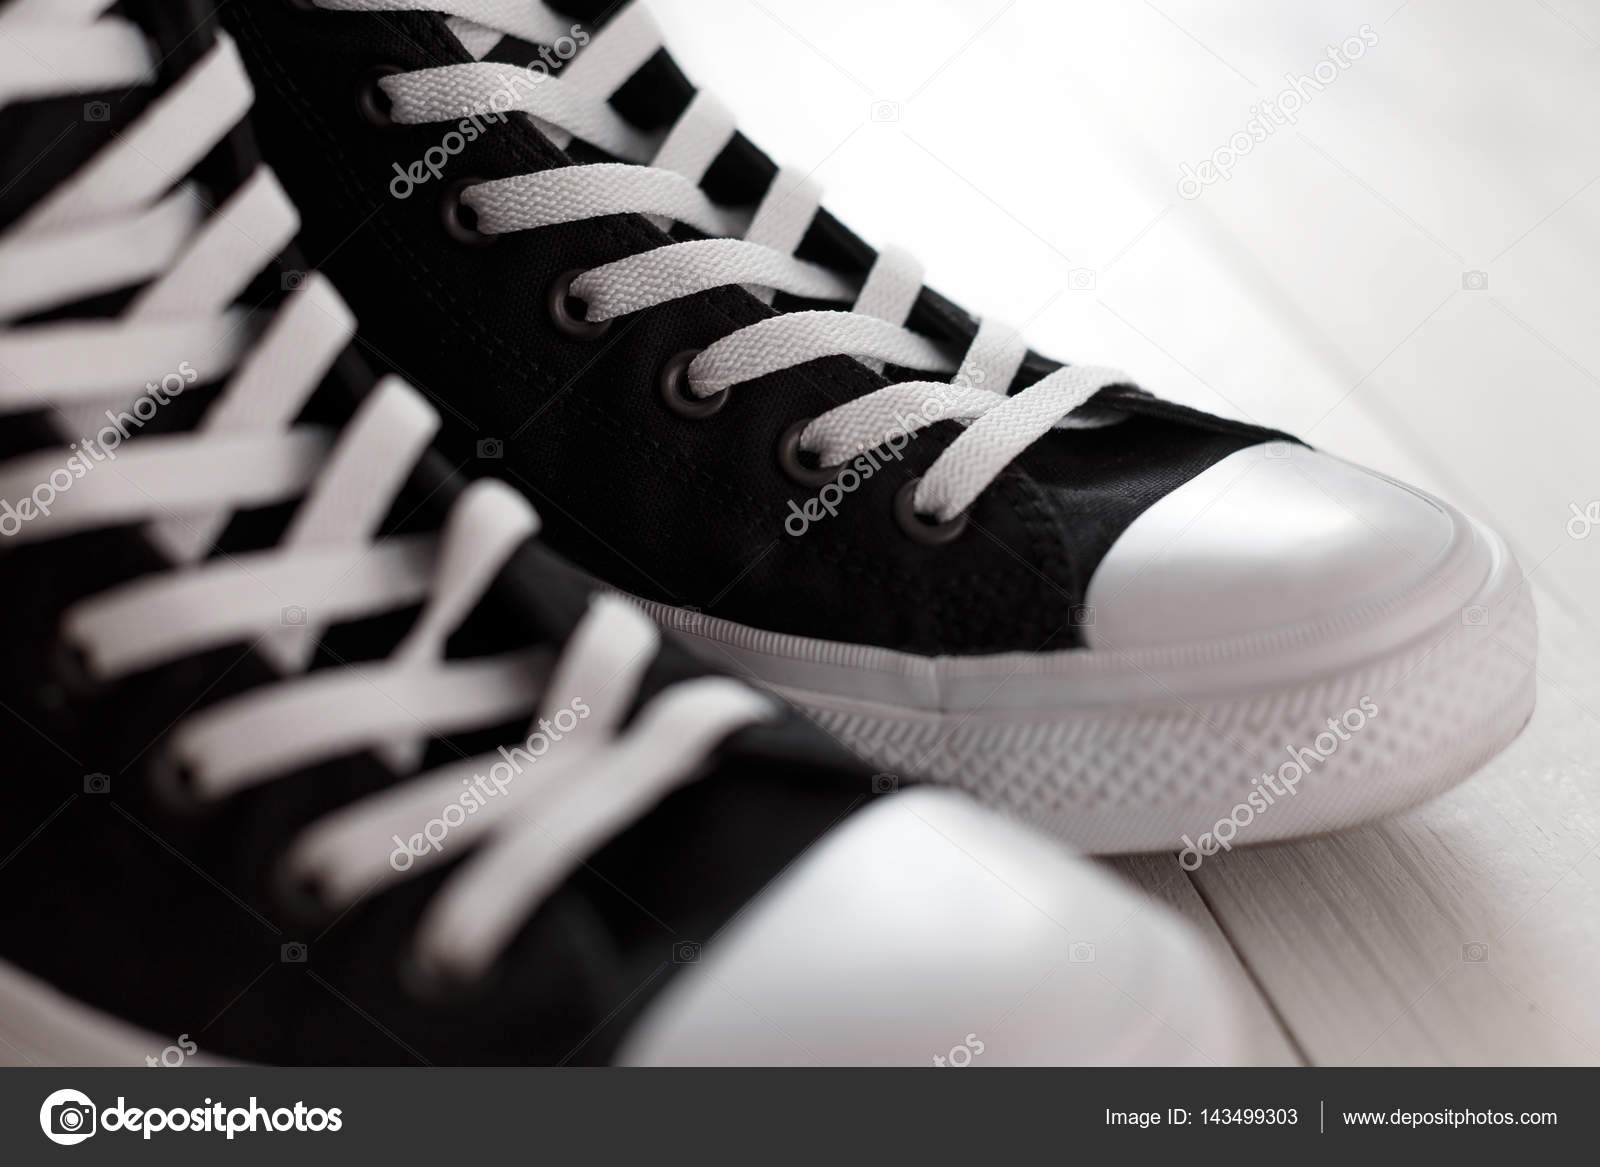 76c28d0011a Μαύρα αθλητικά παπούτσια με λευκά κορδόνια σε λευκό φόντο — Εικόνα από ...